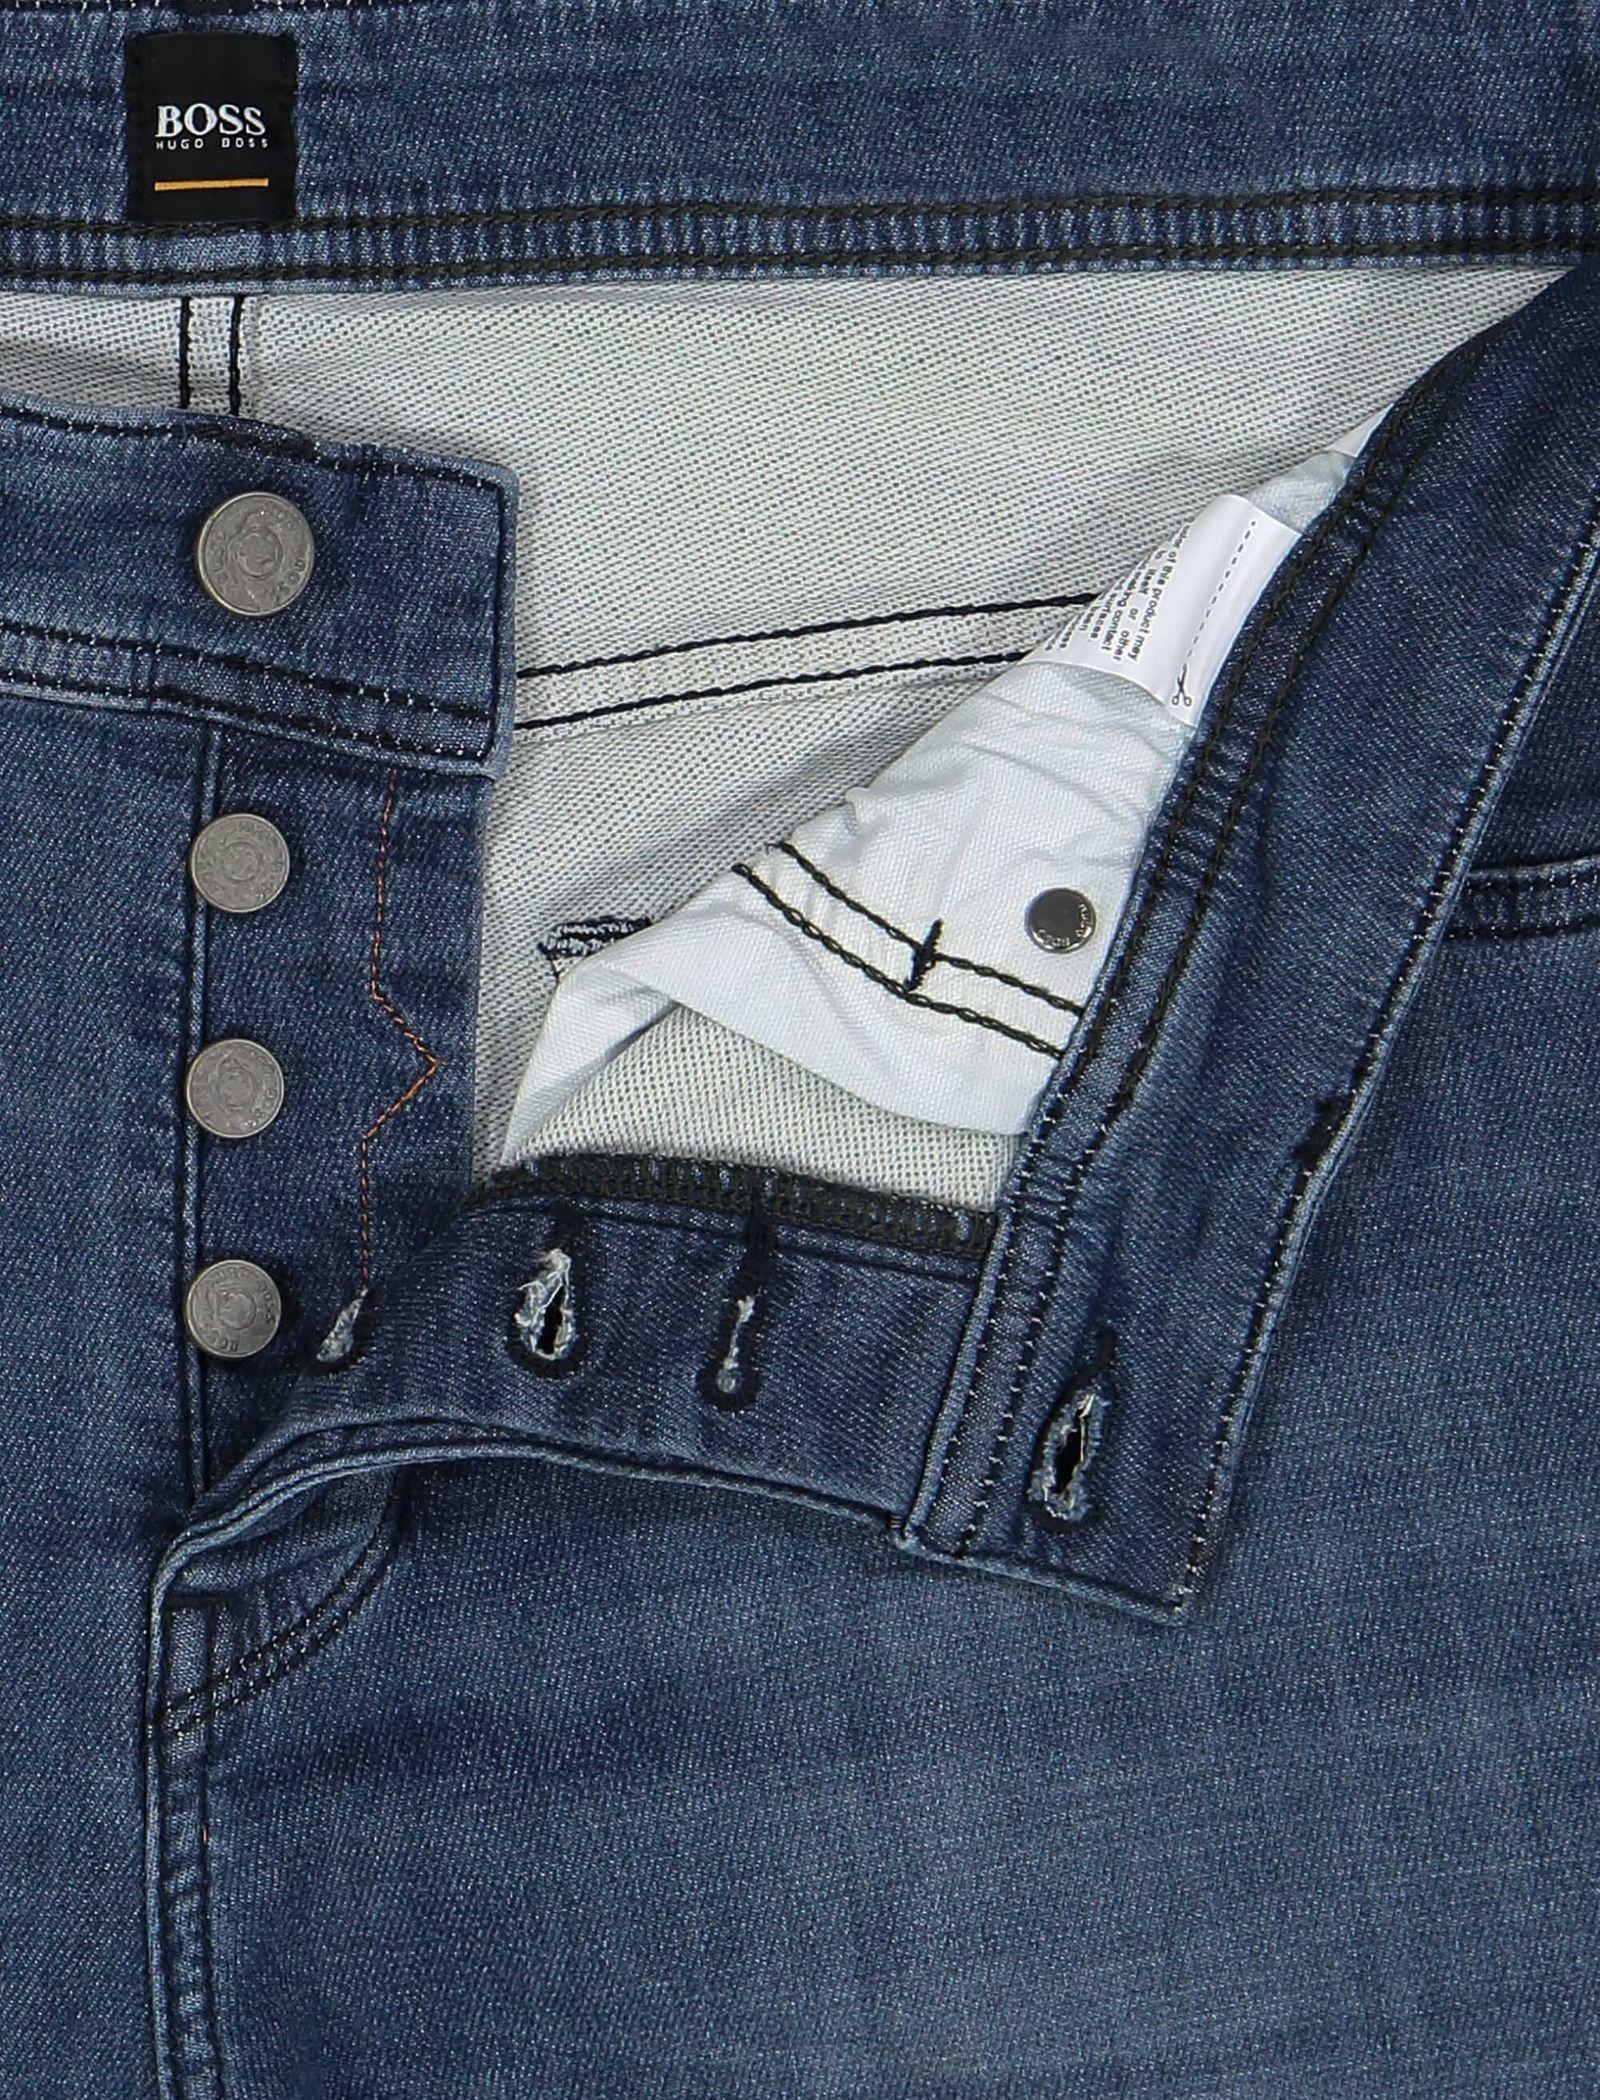 شلوار جین راسته مردانه Orange90-P SUAVE - باس اورنج - آبي تيره - 7